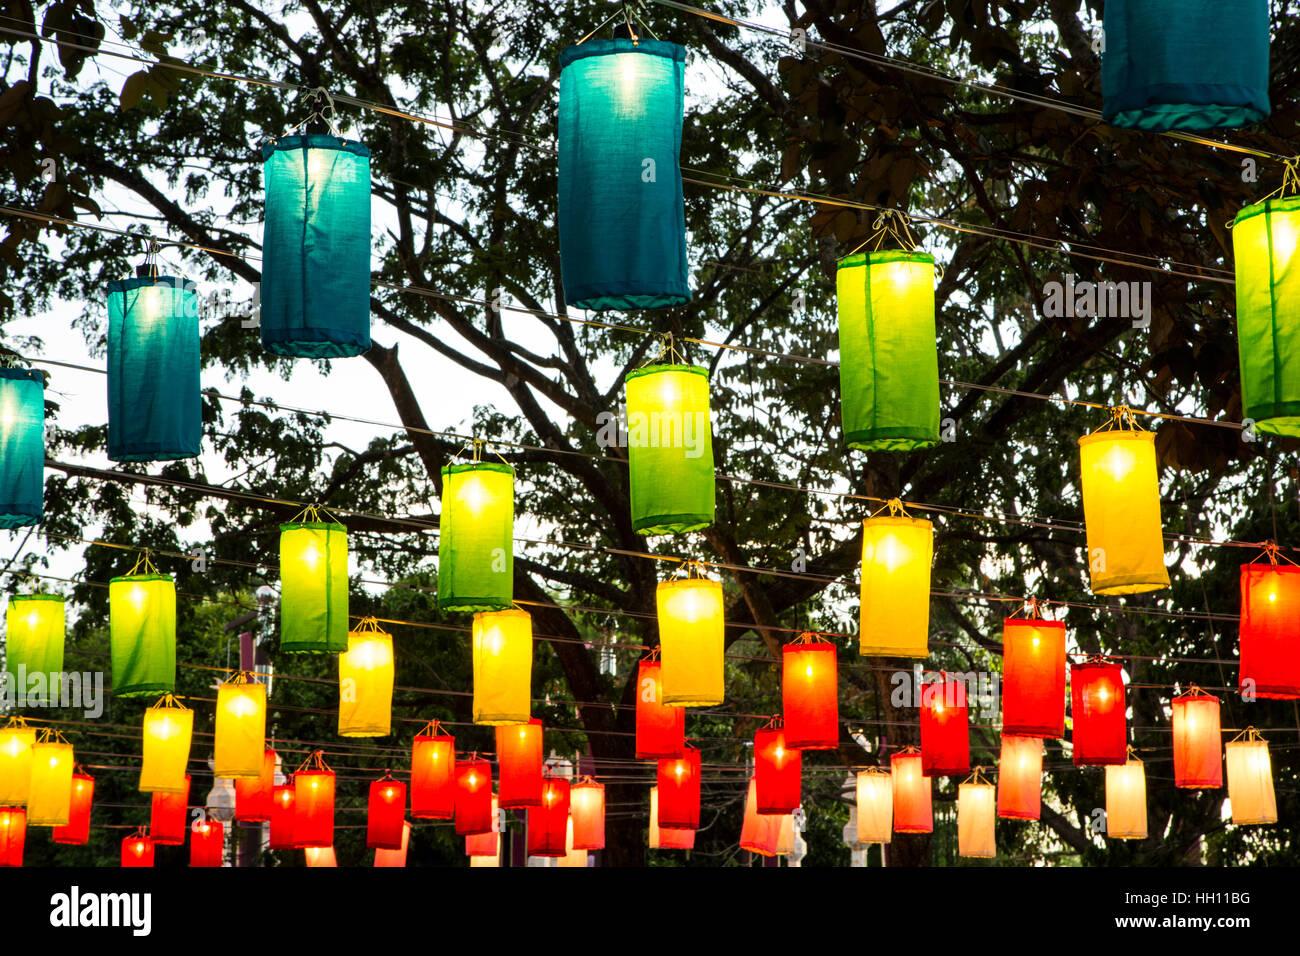 Colorful lanterns, Yeepeng Lanna International Lantern Festival, Lanna Dhutanka, Chiang Mai, Thailand Stock Photo